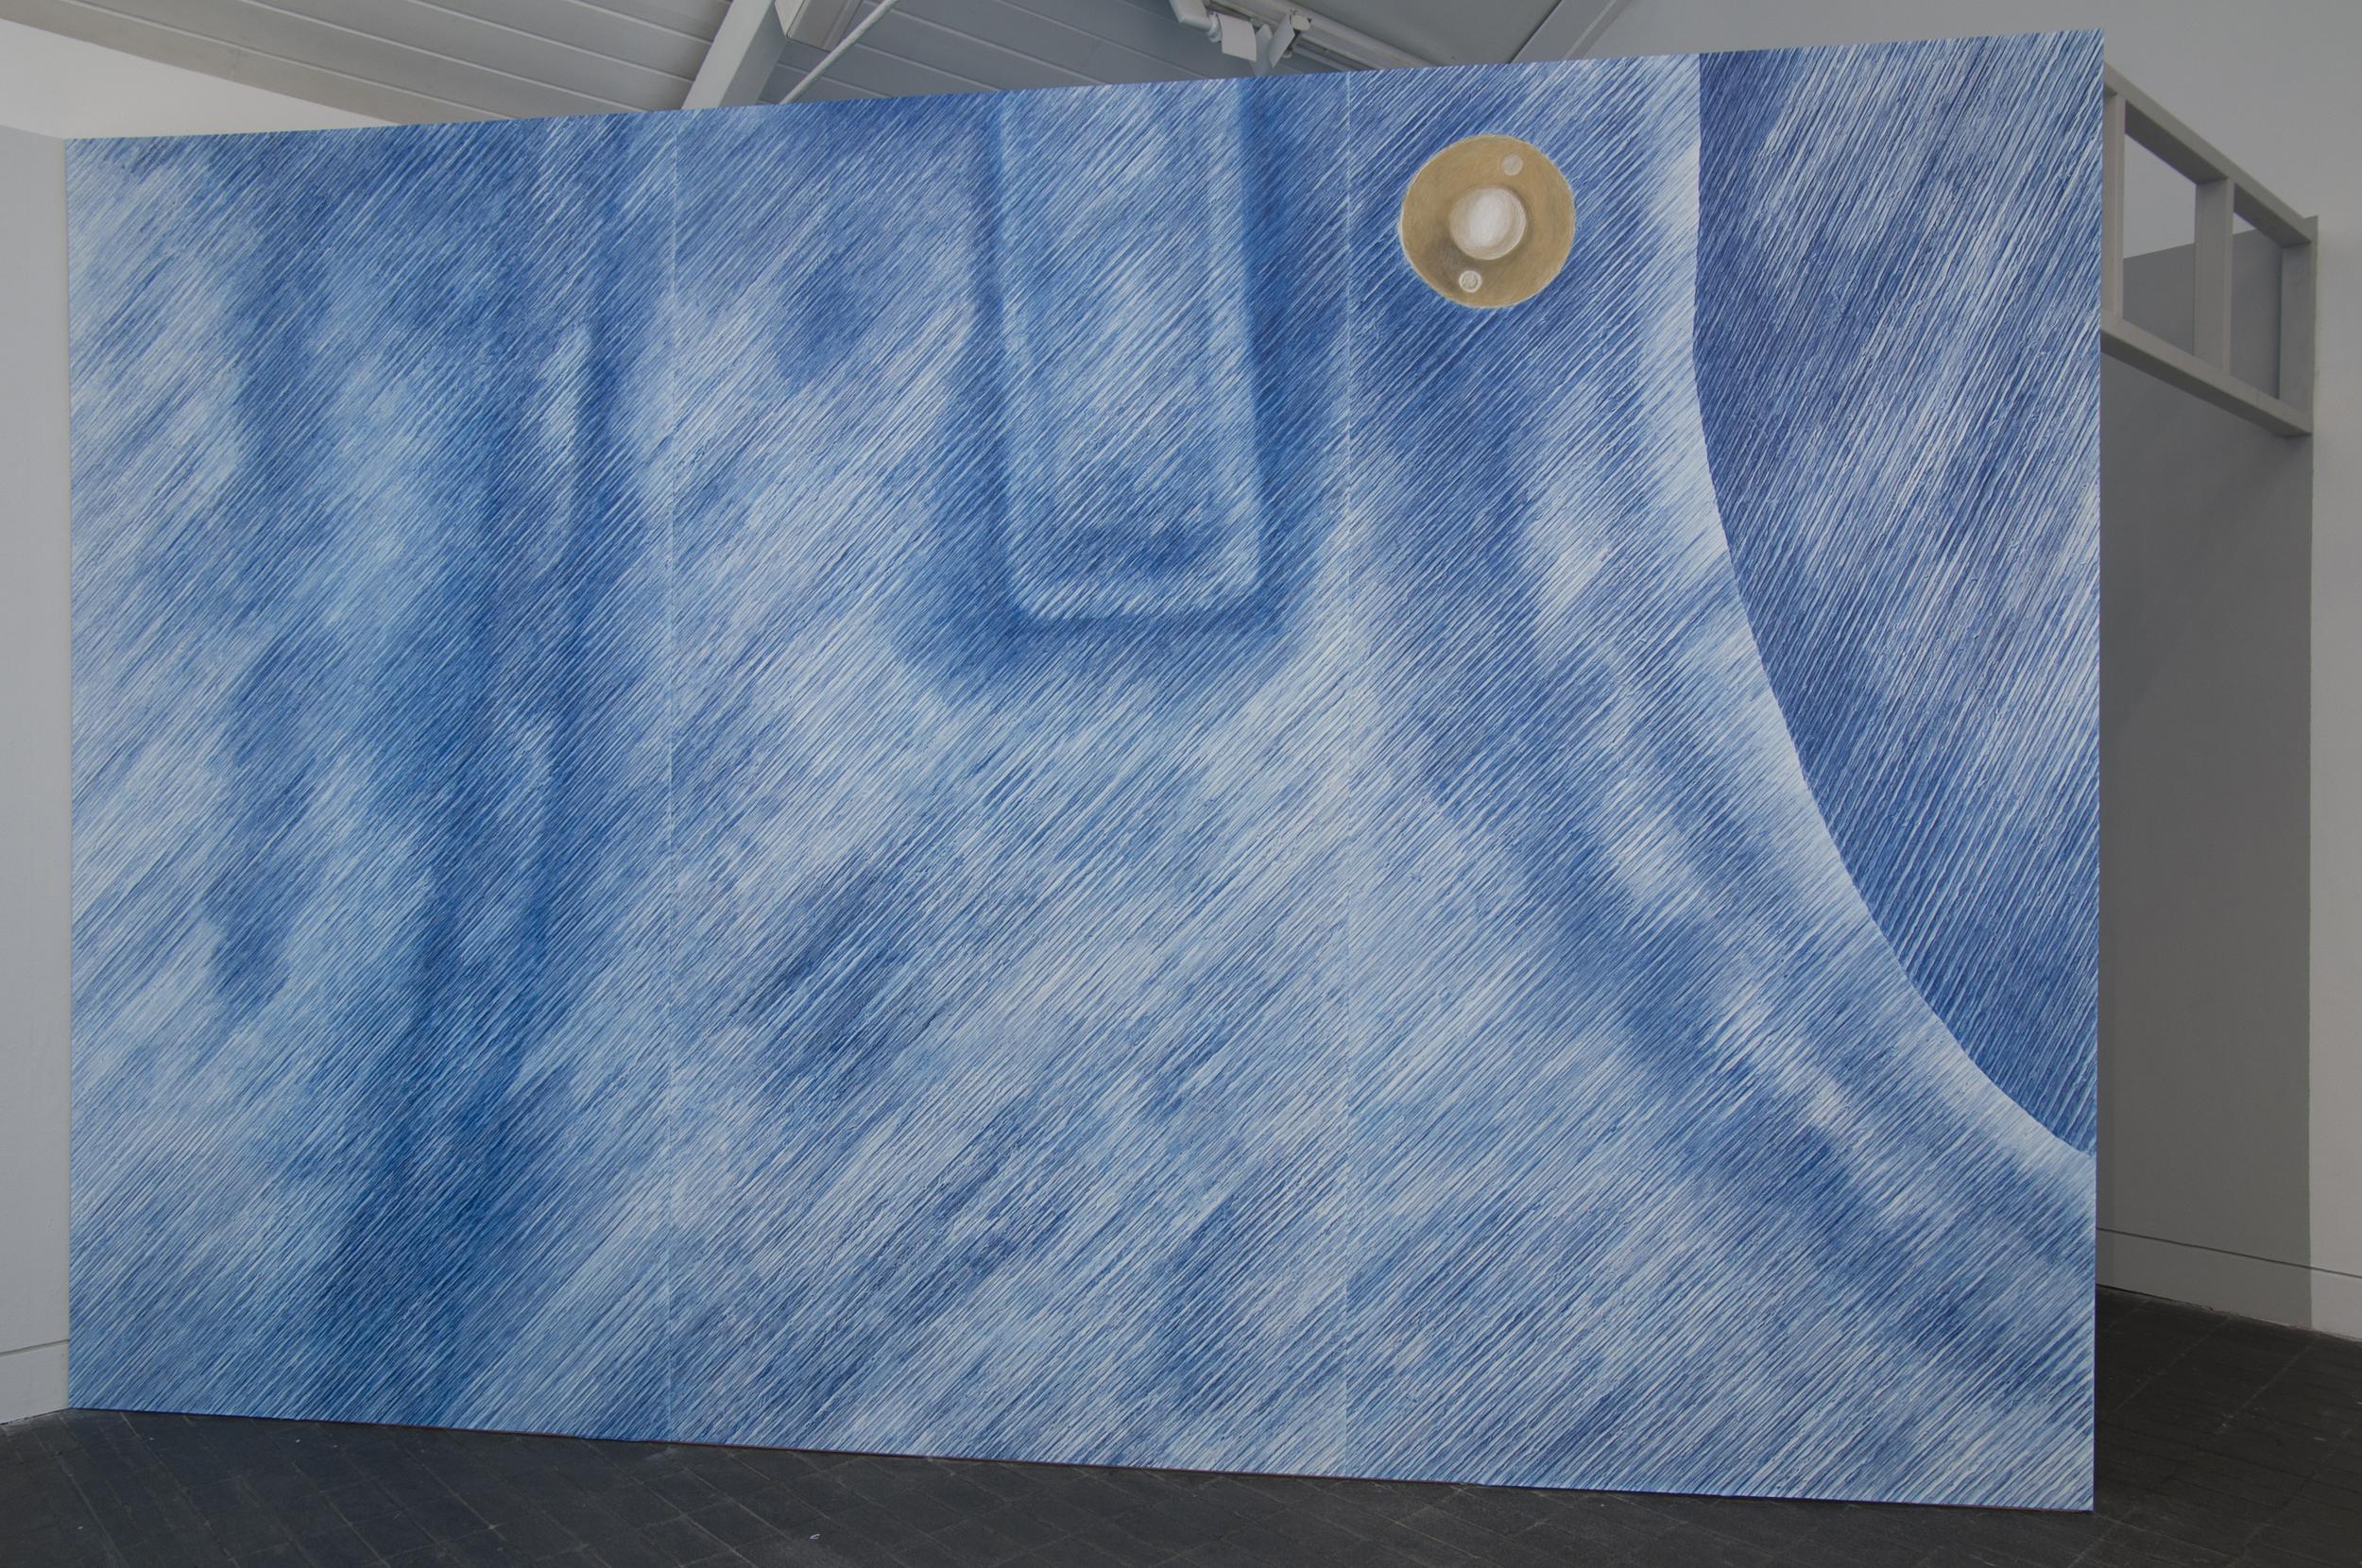 Stud    Pencil rubbing on paper  304.8 cm x 450 cm  Exhibition view Jerwood Space, London  2014  Photo: thisistomorrow.info